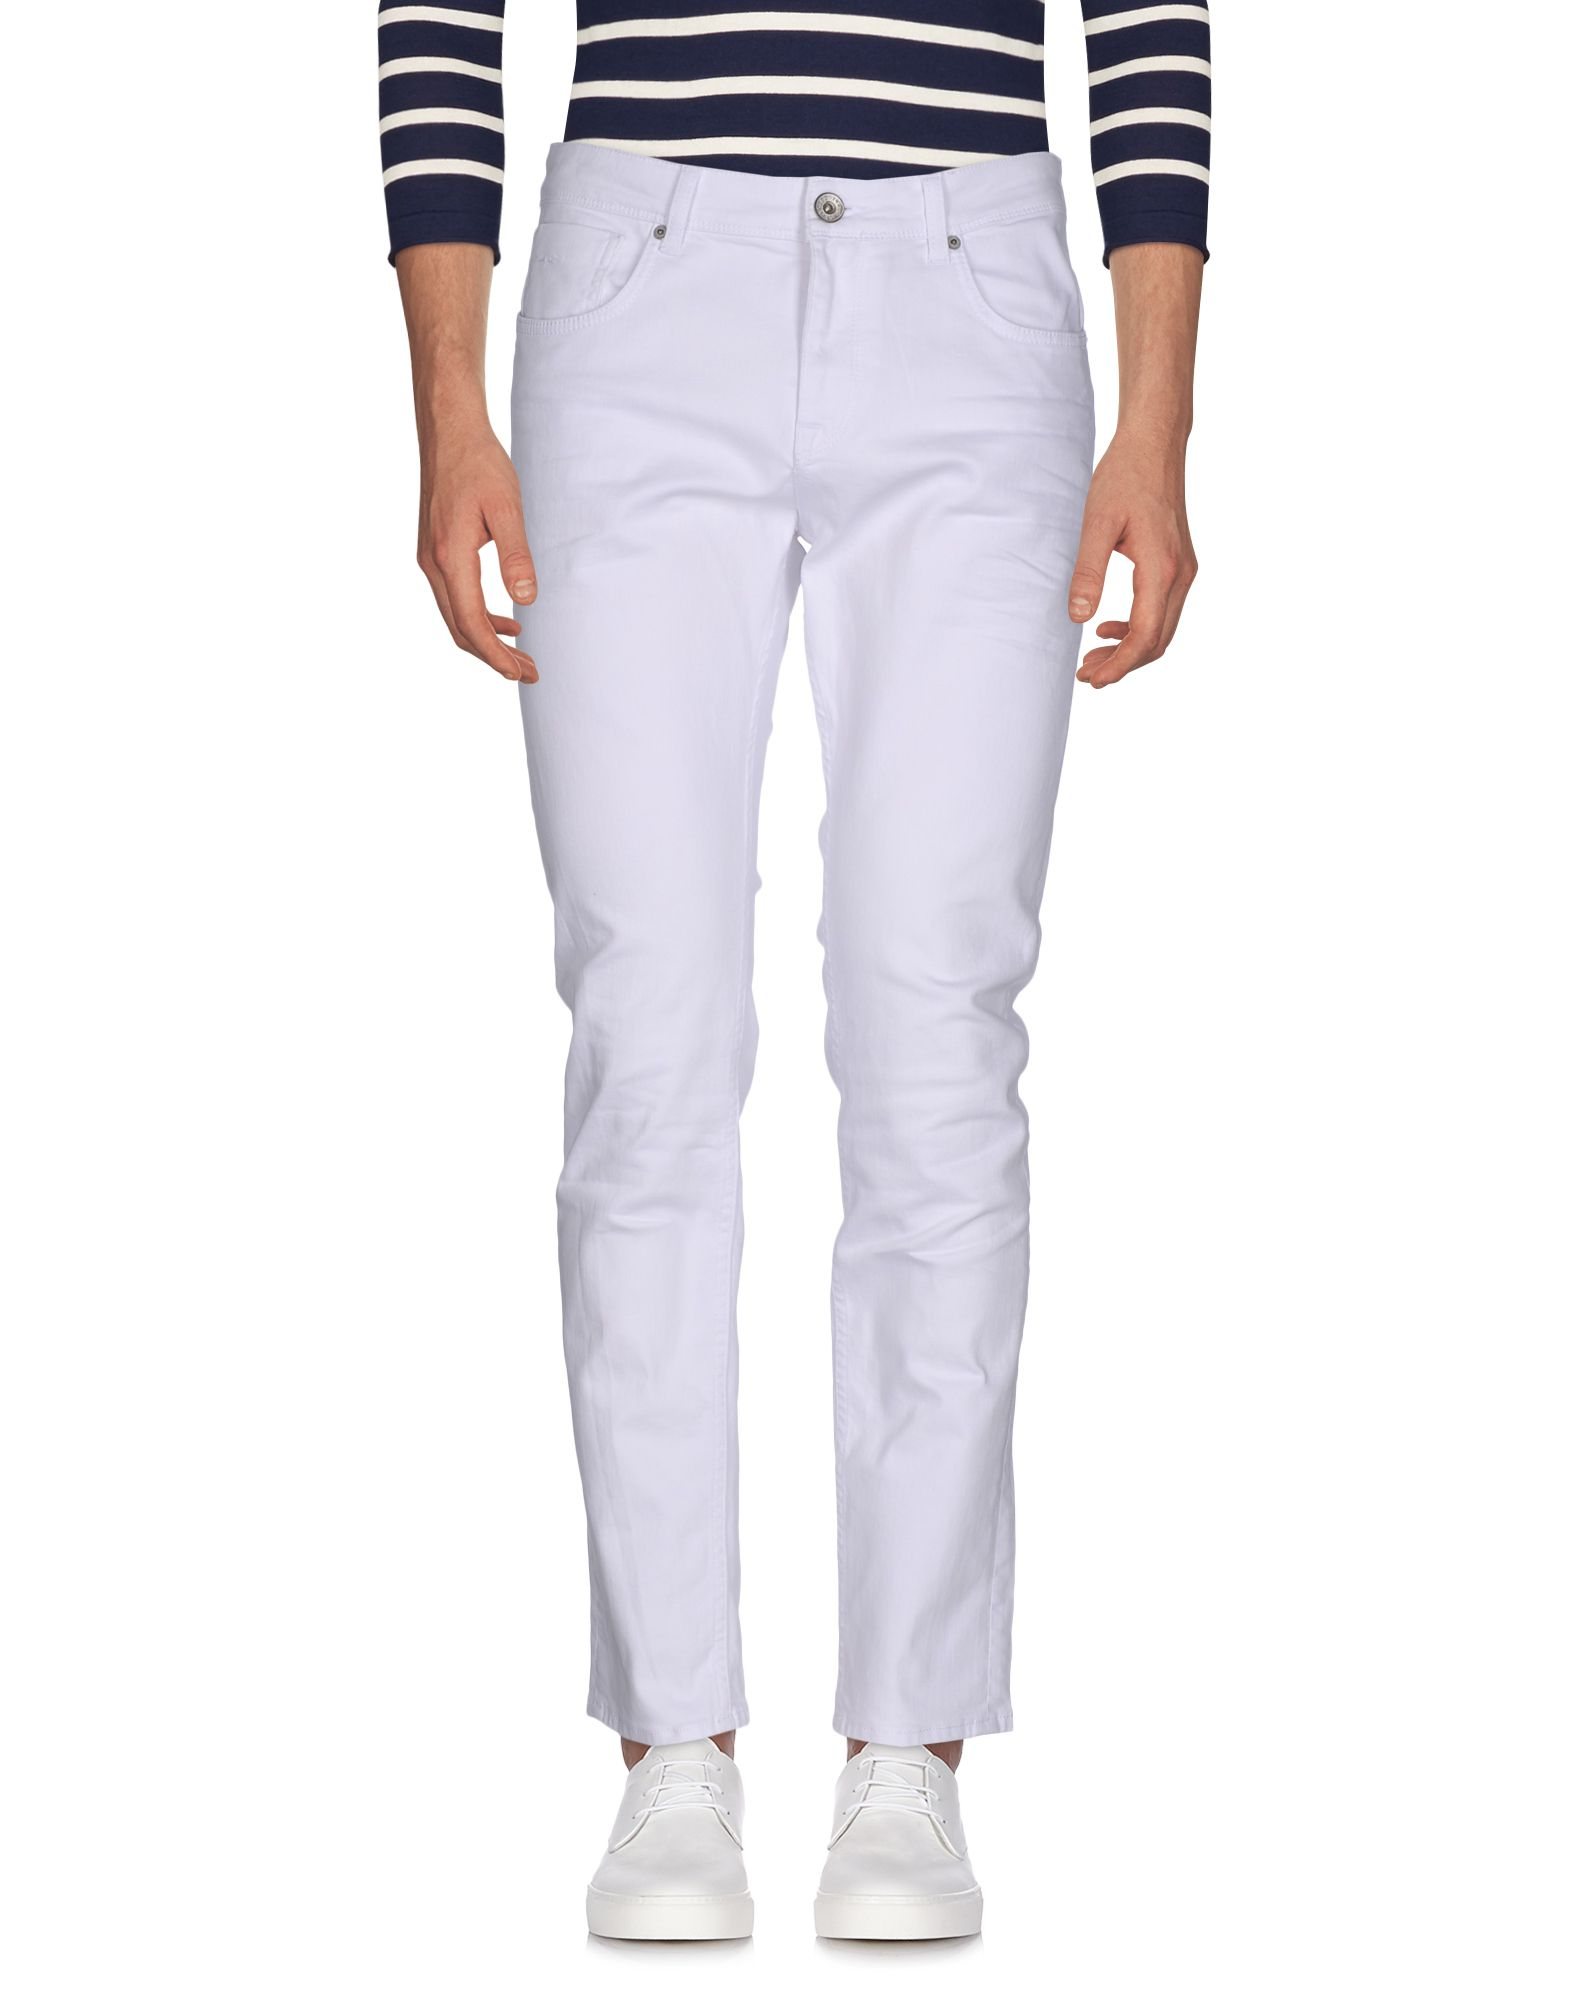 ANTONIO BANDERAS DESIGN by SELECTED HOMME Джинсовые брюки пальто мужское selected homme antonio banderas цвет черный серый 16051623 размер xxl 52